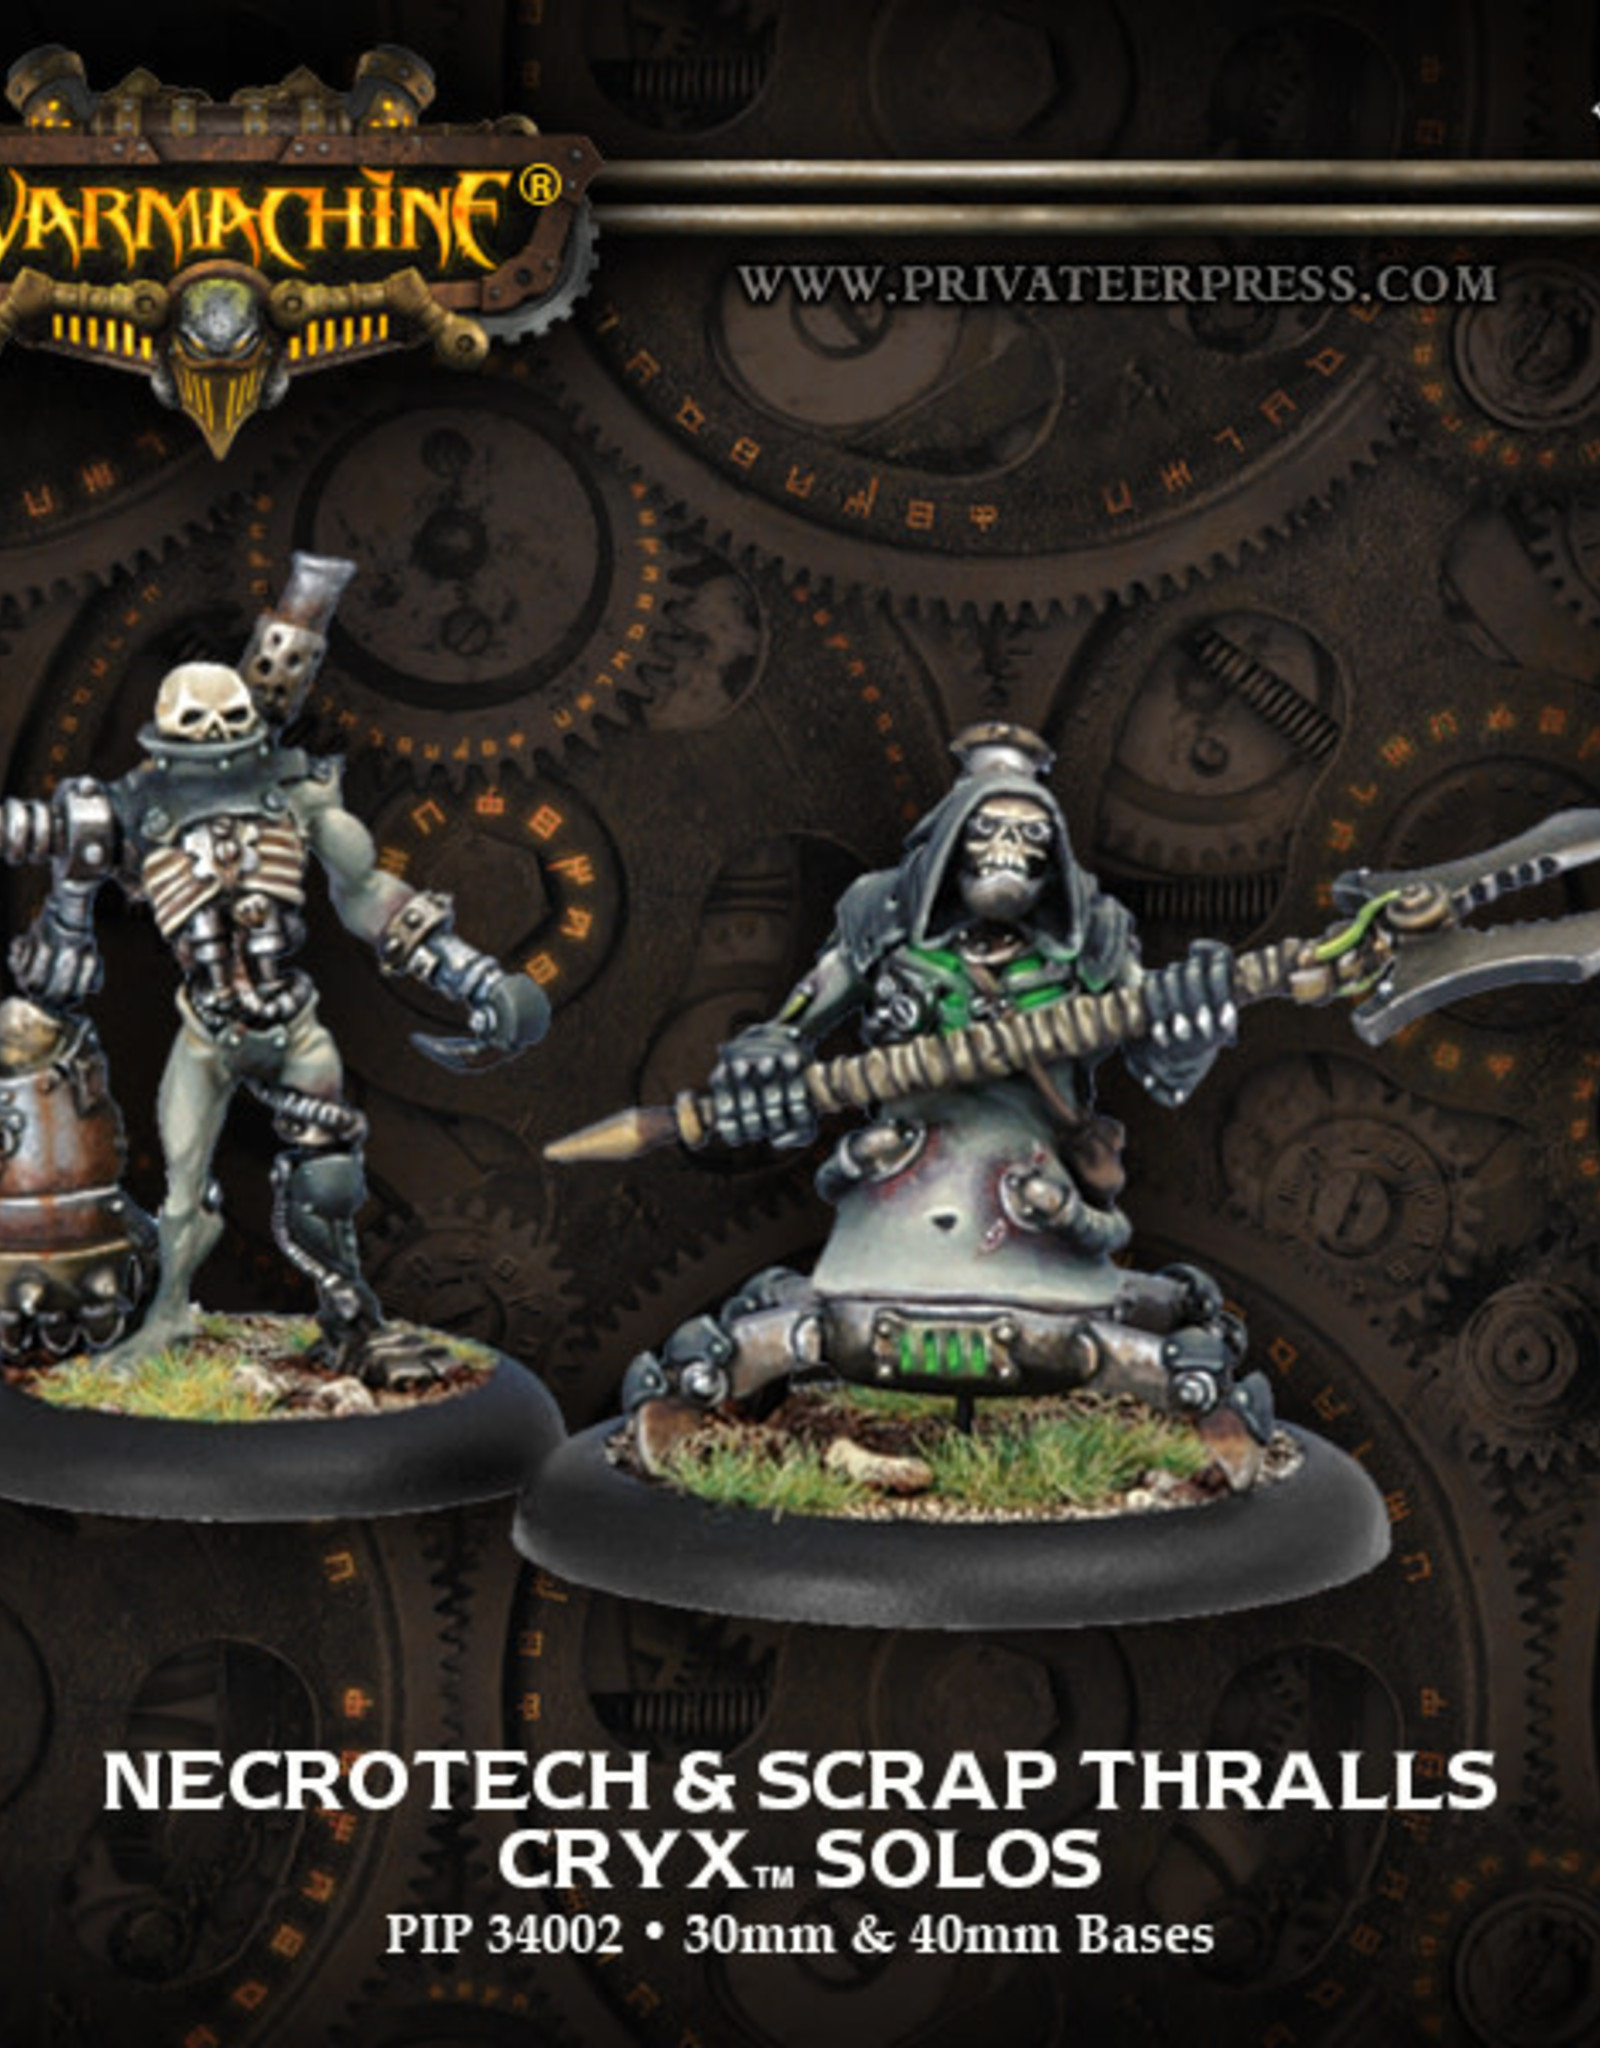 Warmachine Cryx - Necrotech & Thralls